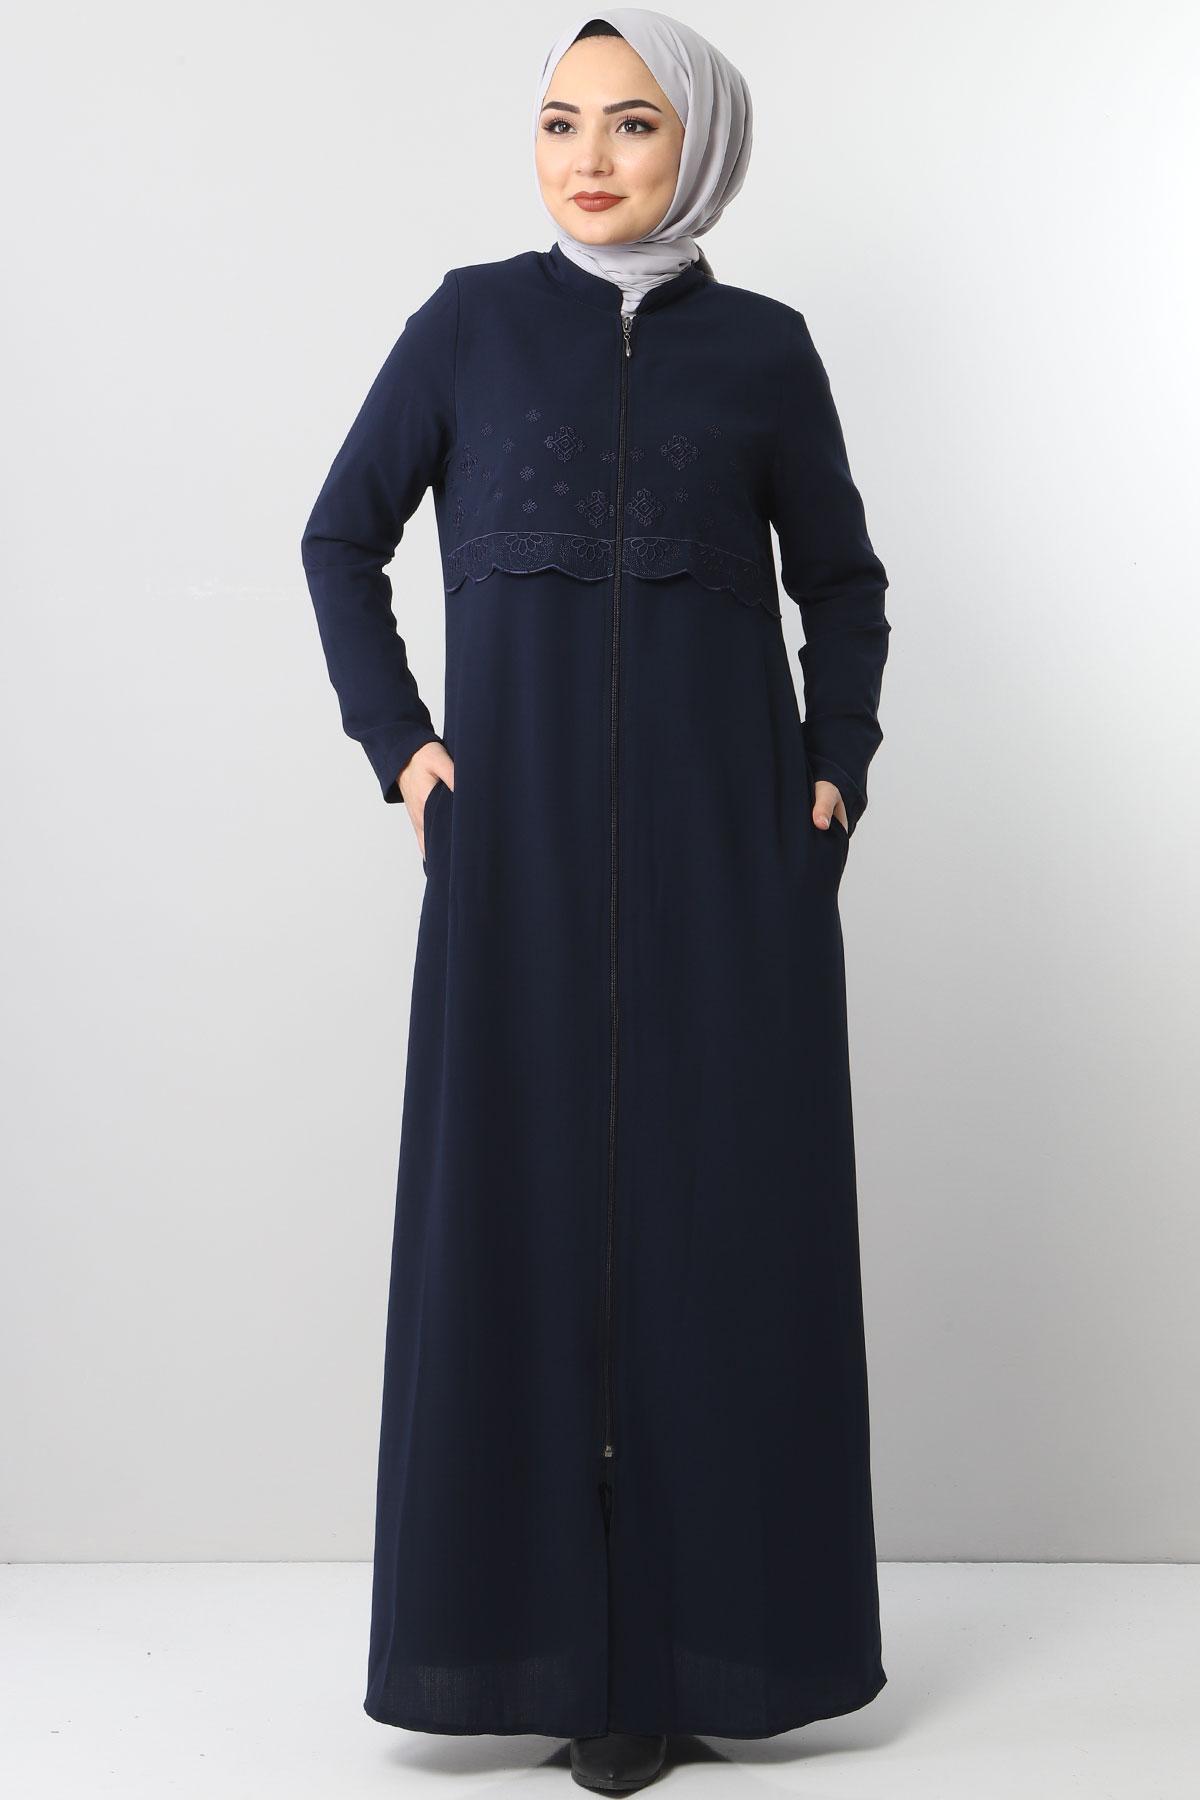 Embroidered Abaya TSD2510 Navy Blue